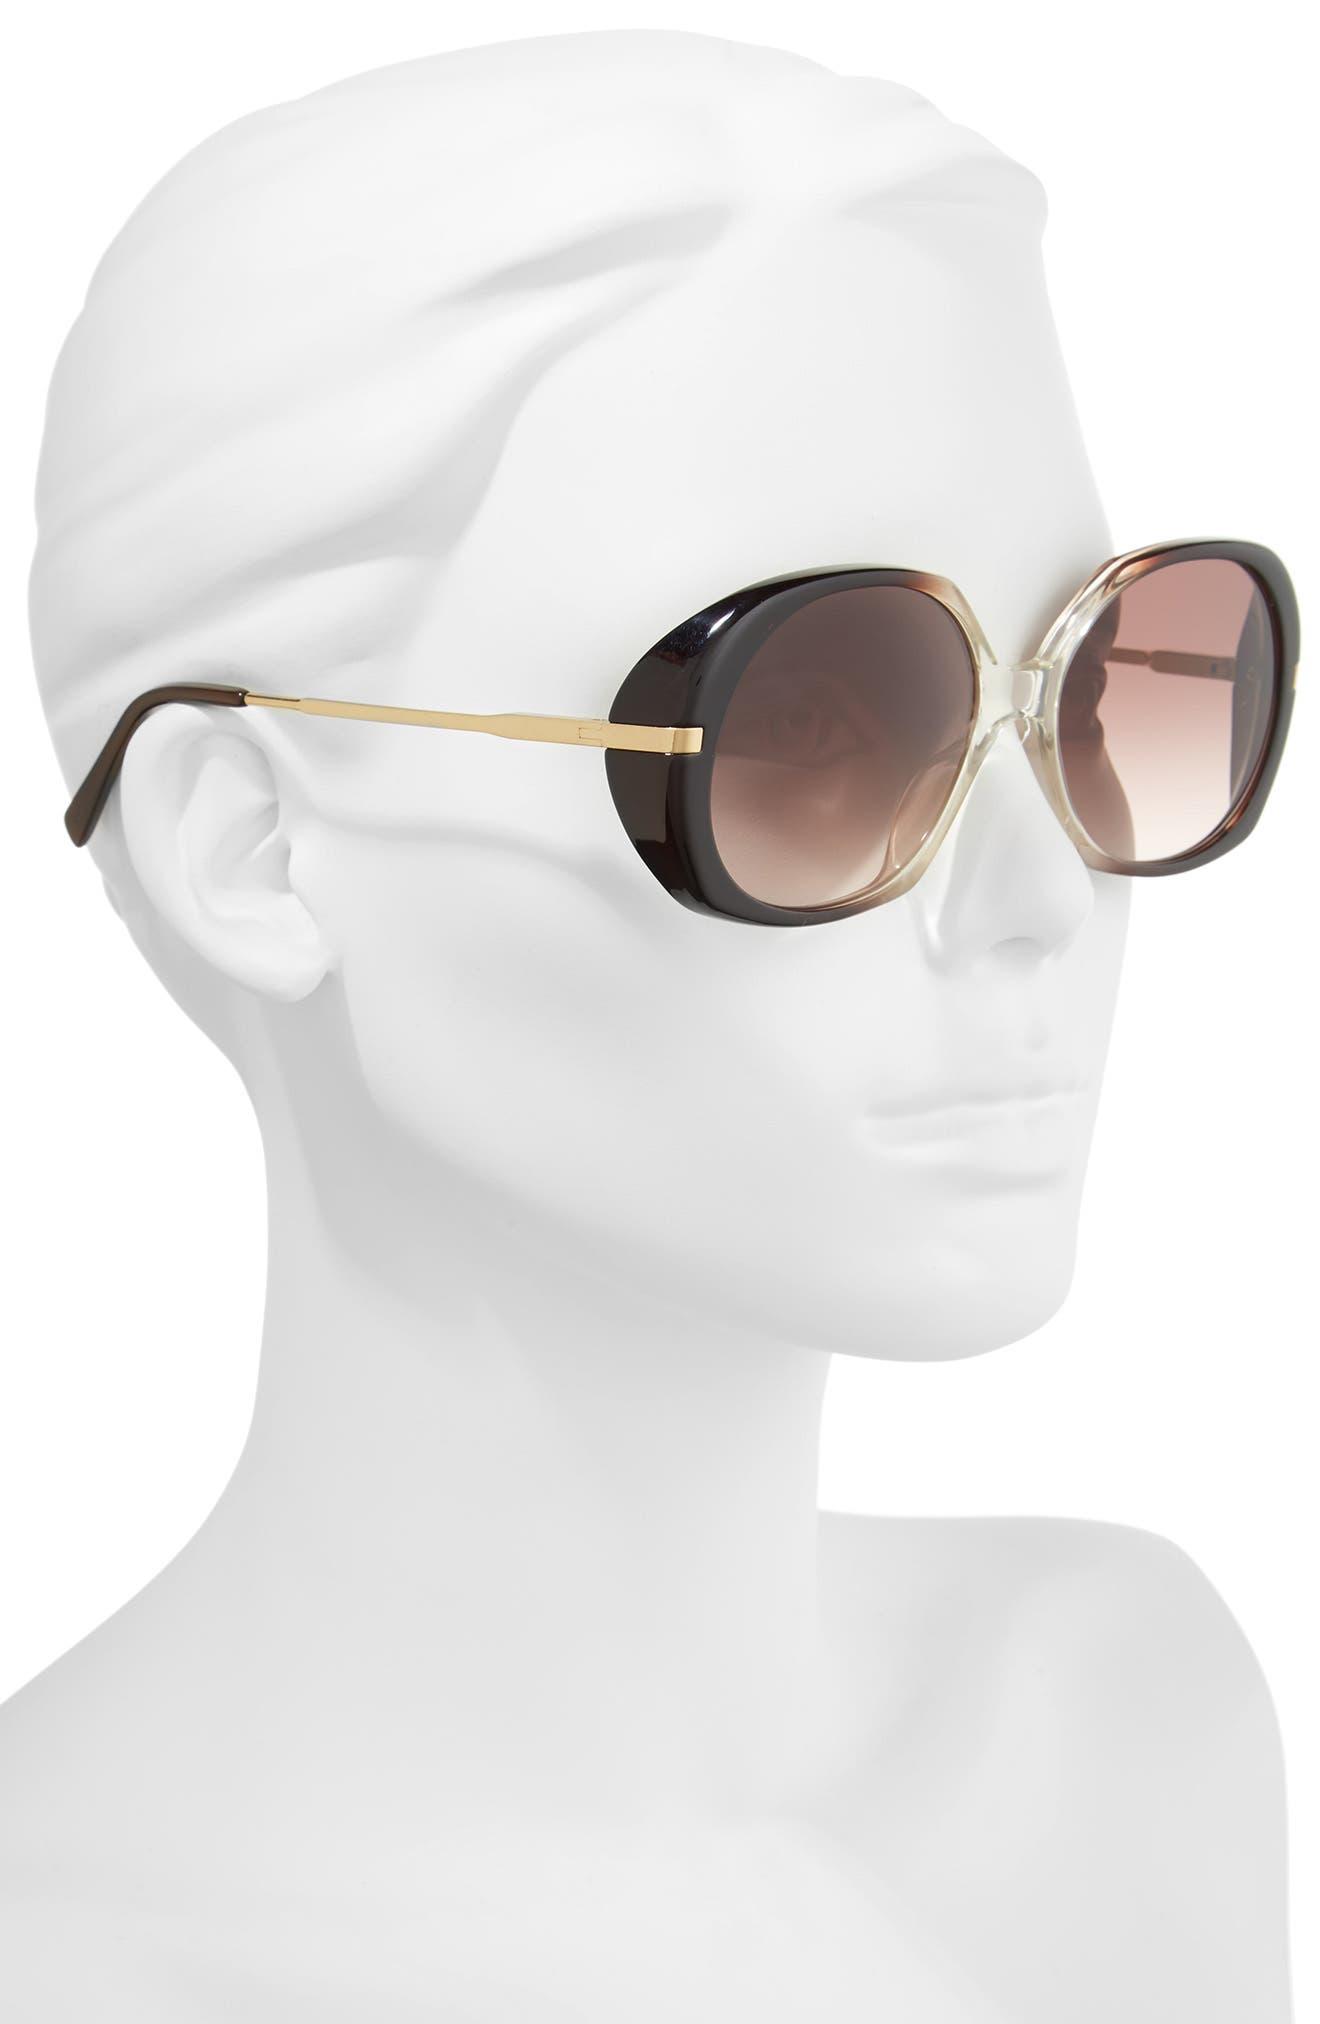 56mm Round Sunglasses,                             Alternate thumbnail 2, color,                             Dark Brown/ Light Gold/ Brown